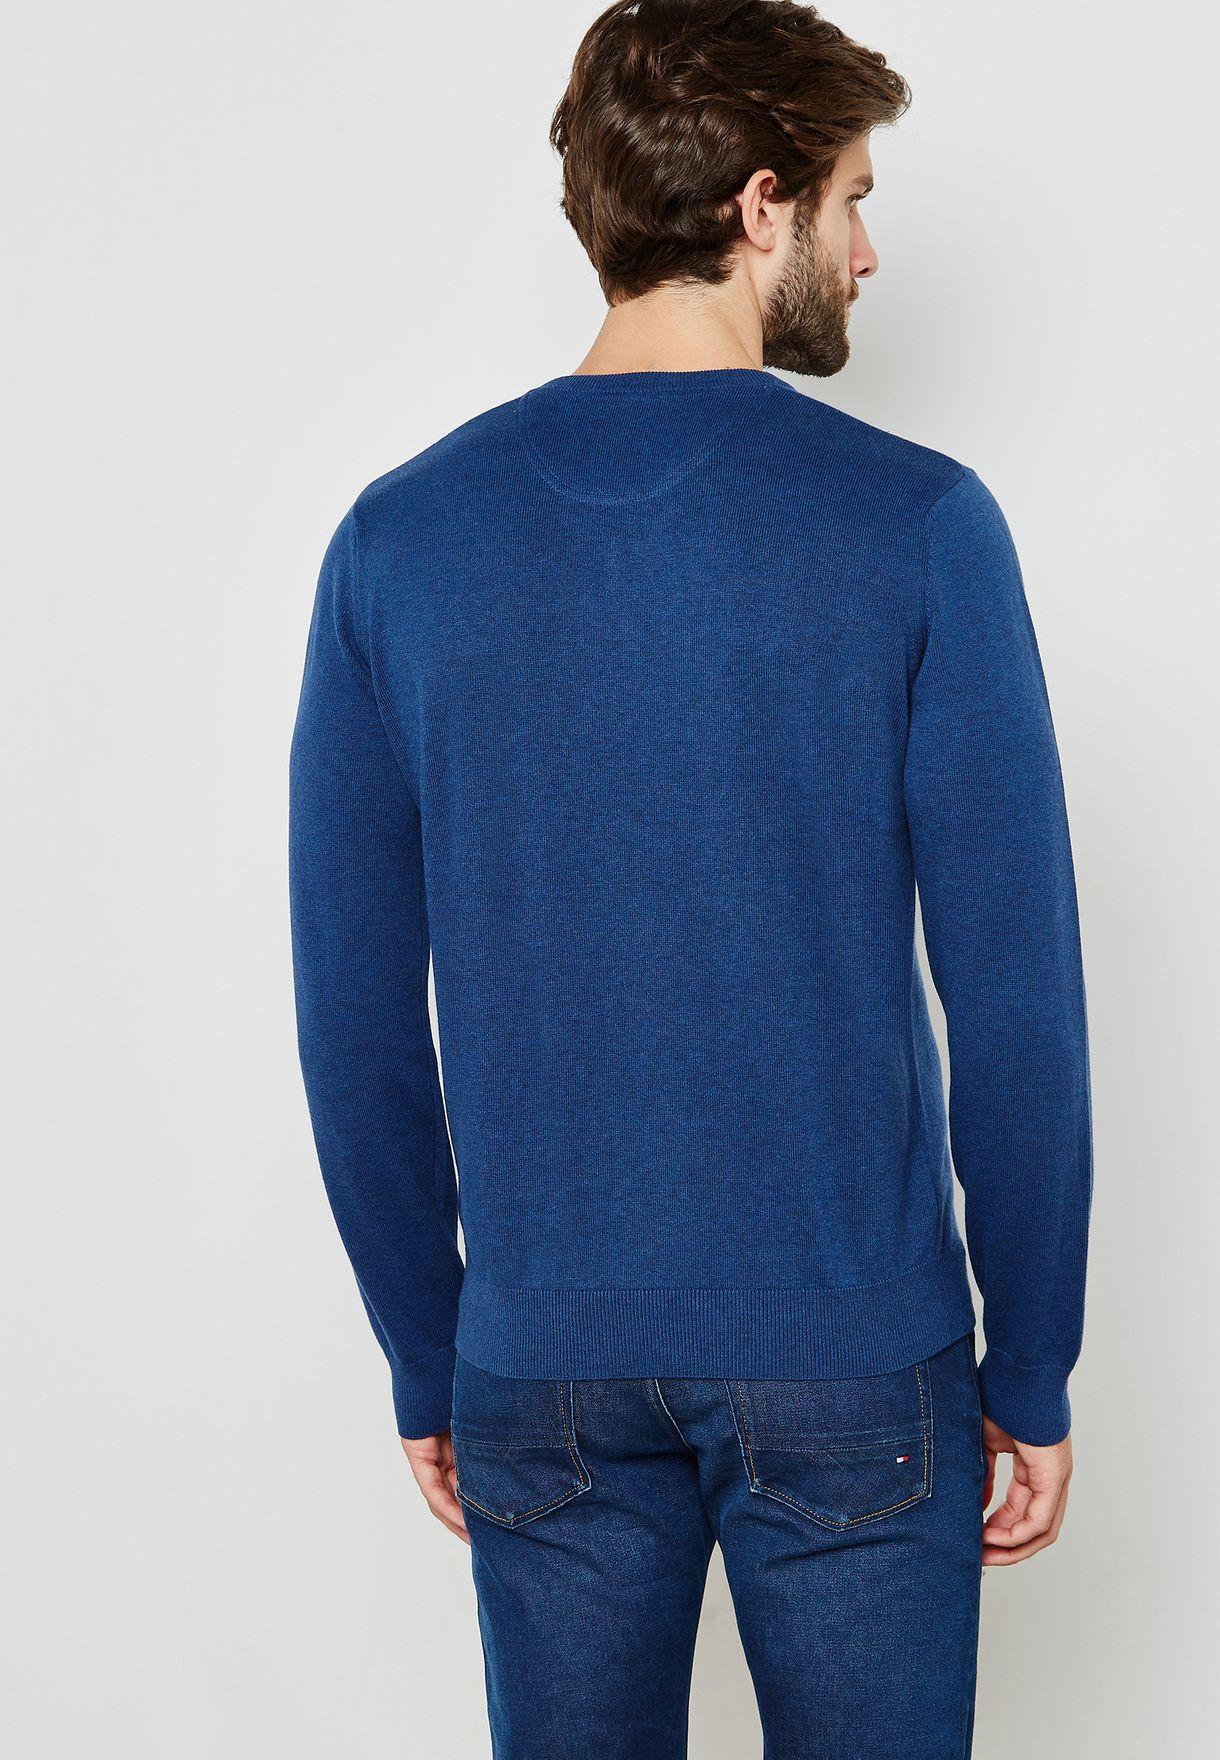 Croc Logo Sweater